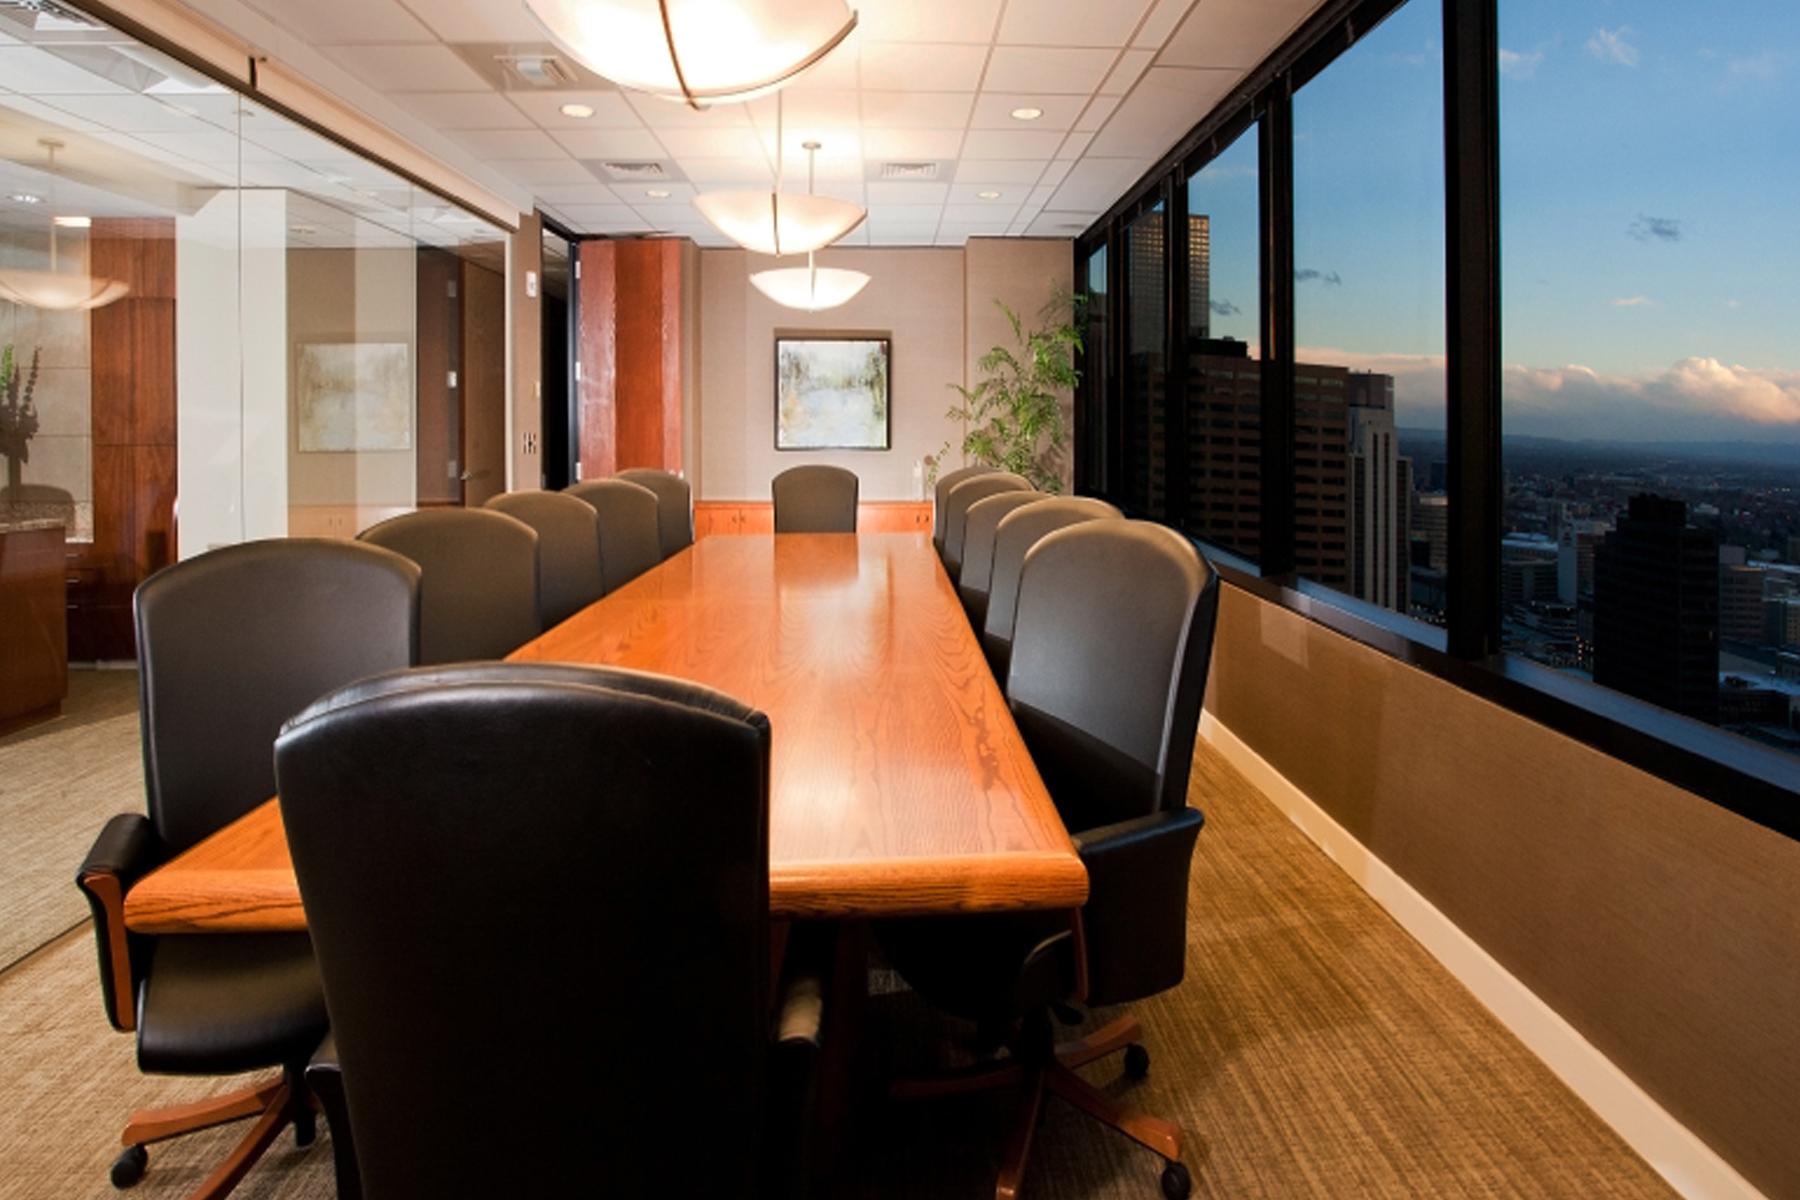 Denver Office Buildout, Colorado- Jordy Construction 2